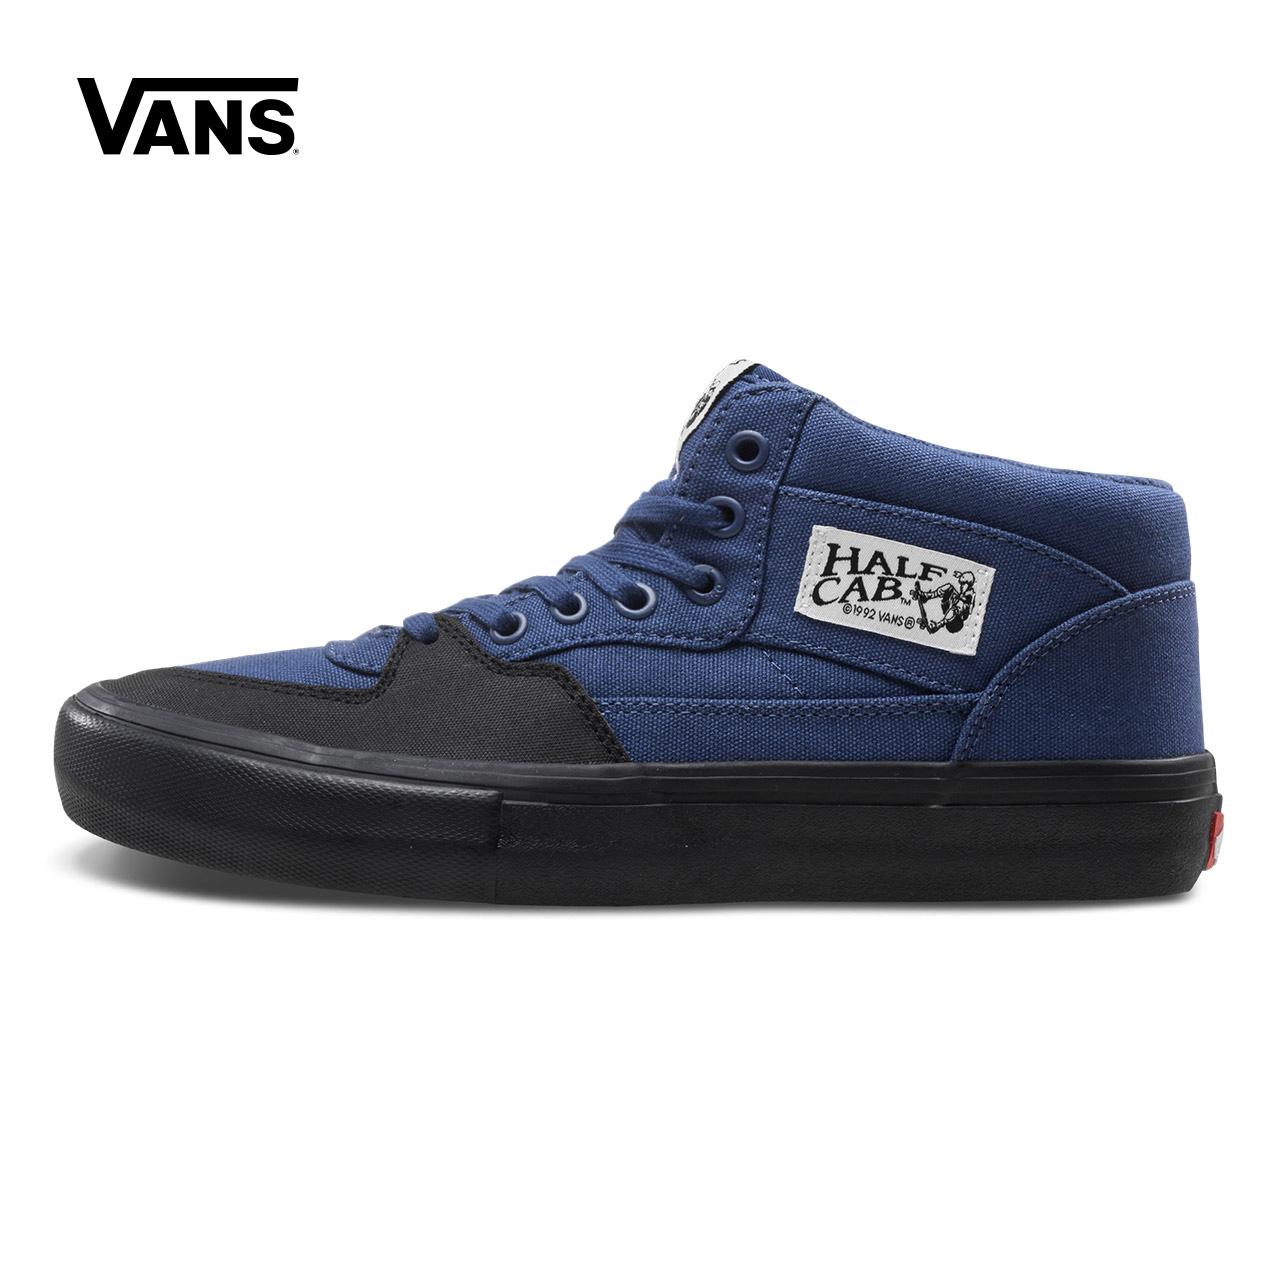 Vans 范斯官方男款HALF CAB滑板鞋|VN0A38CPU1S